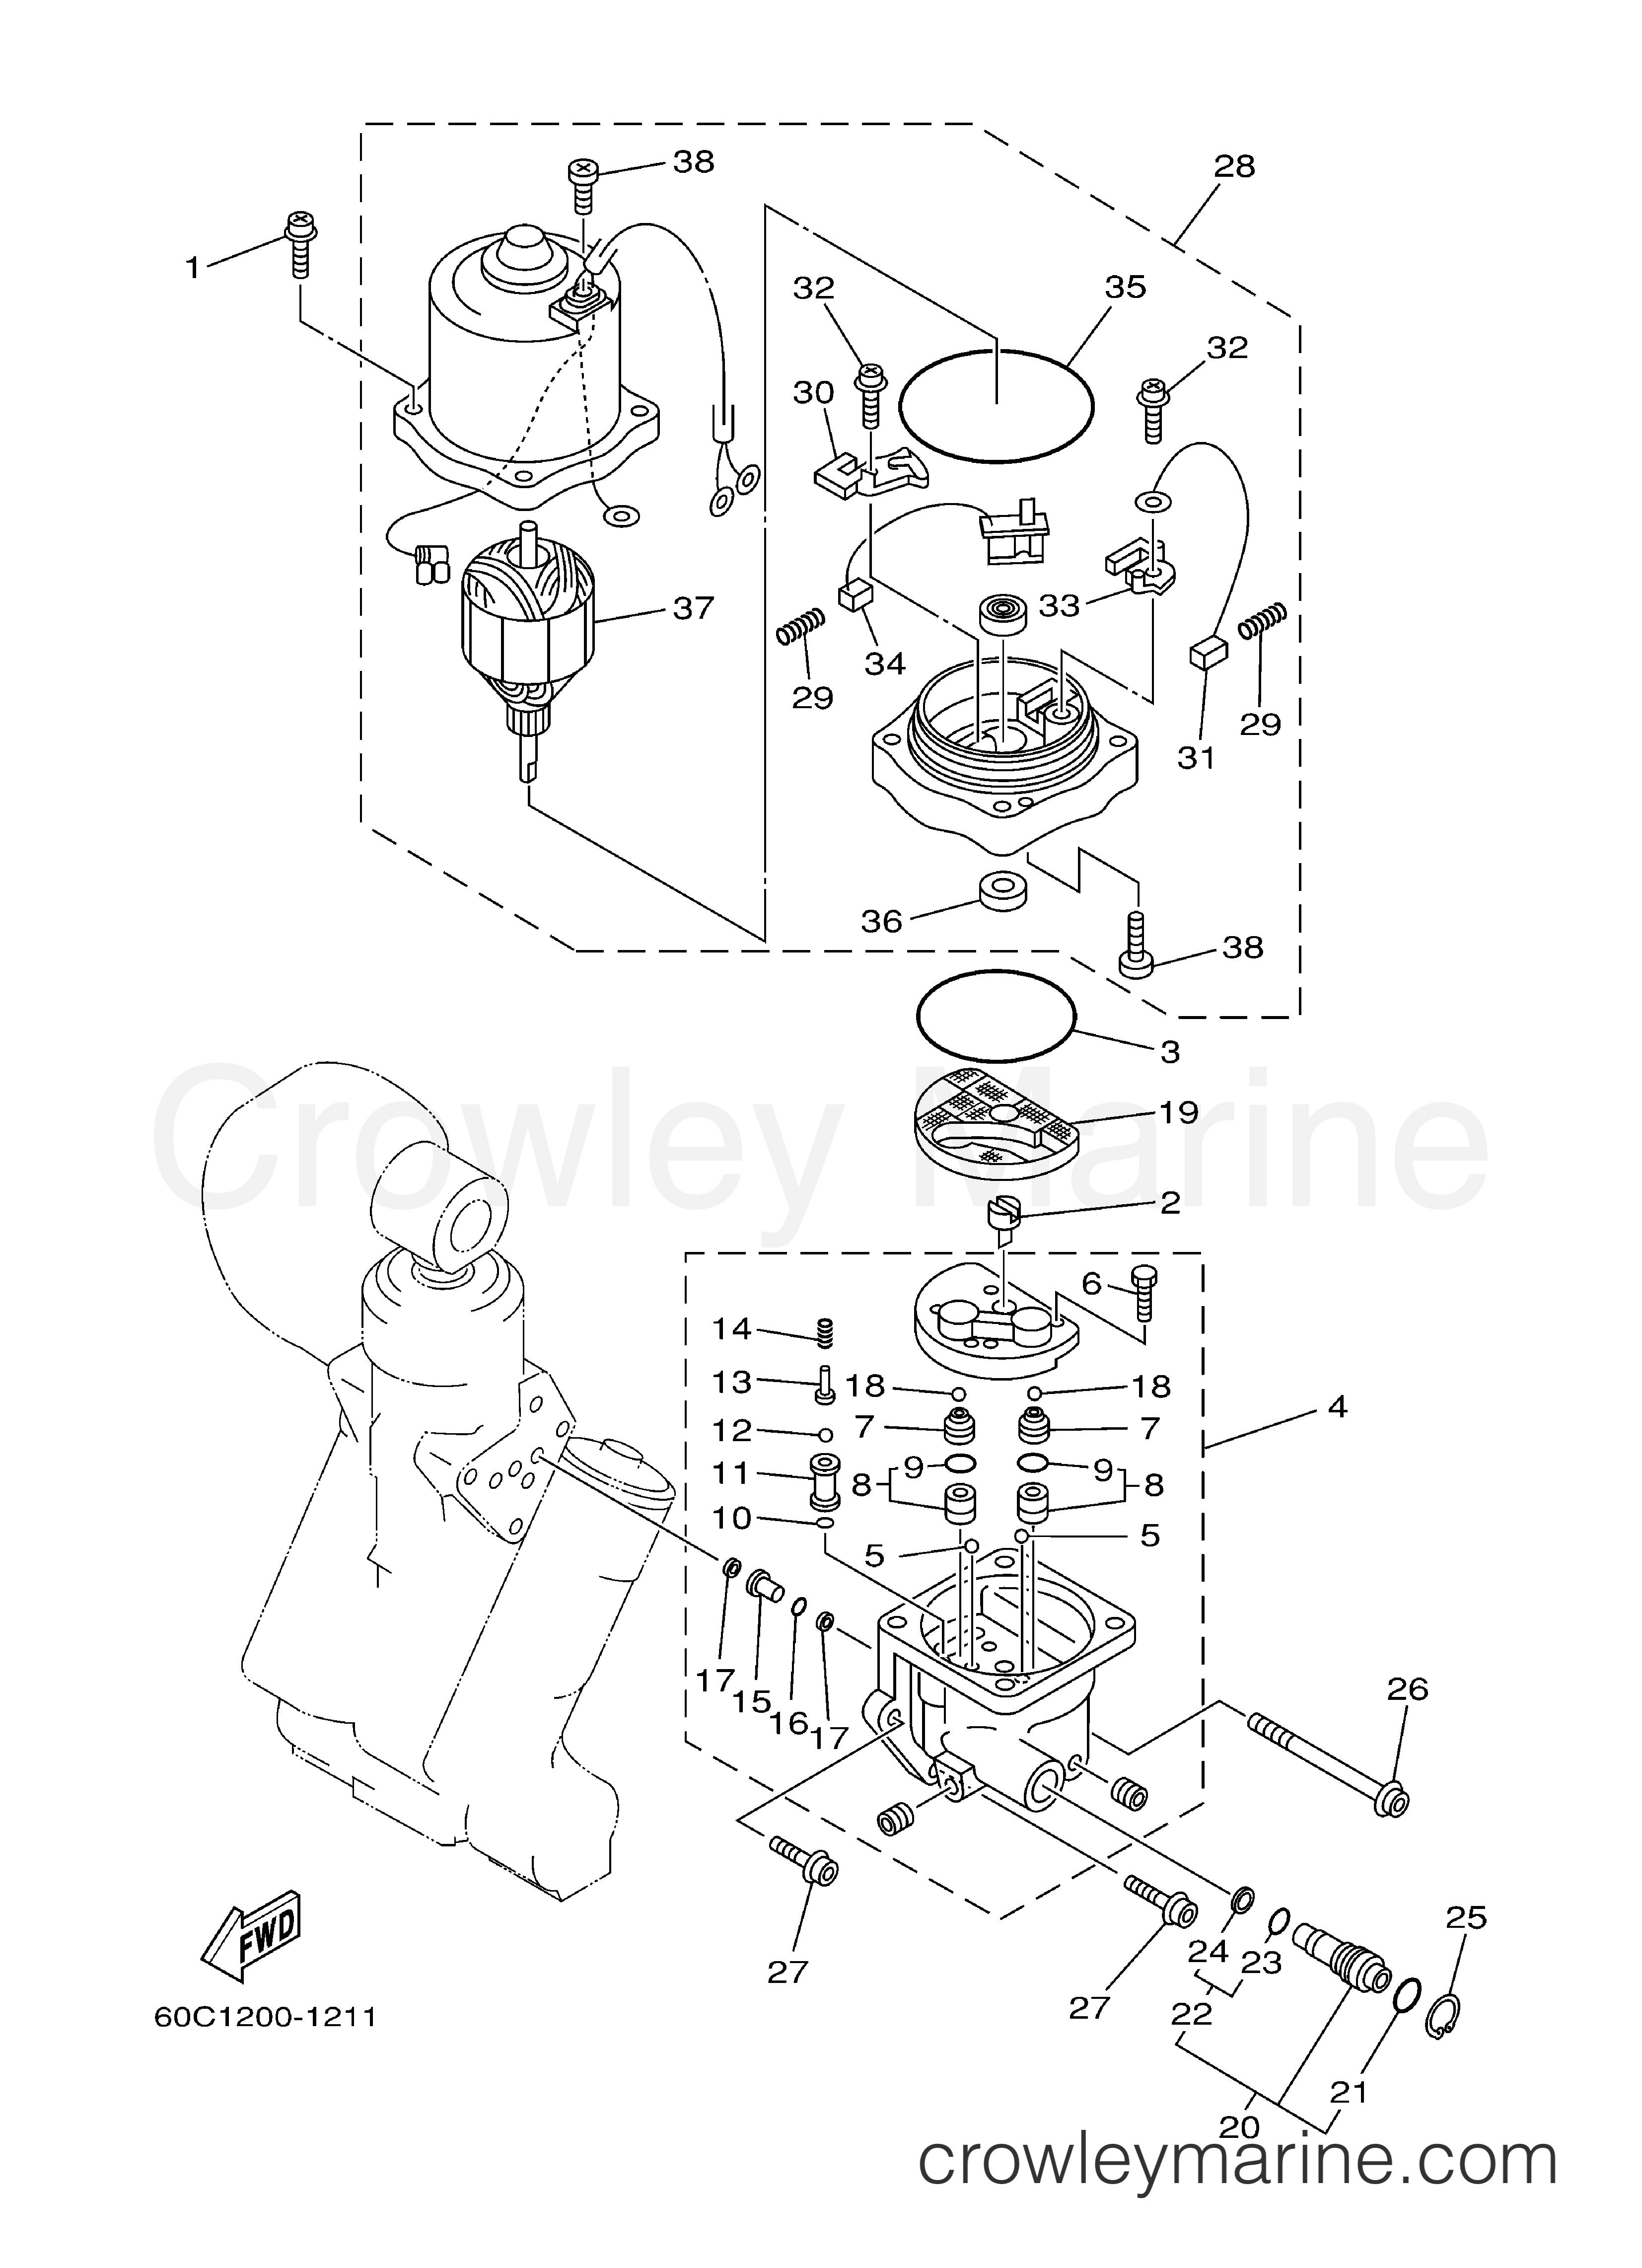 power trim tilt assy 2